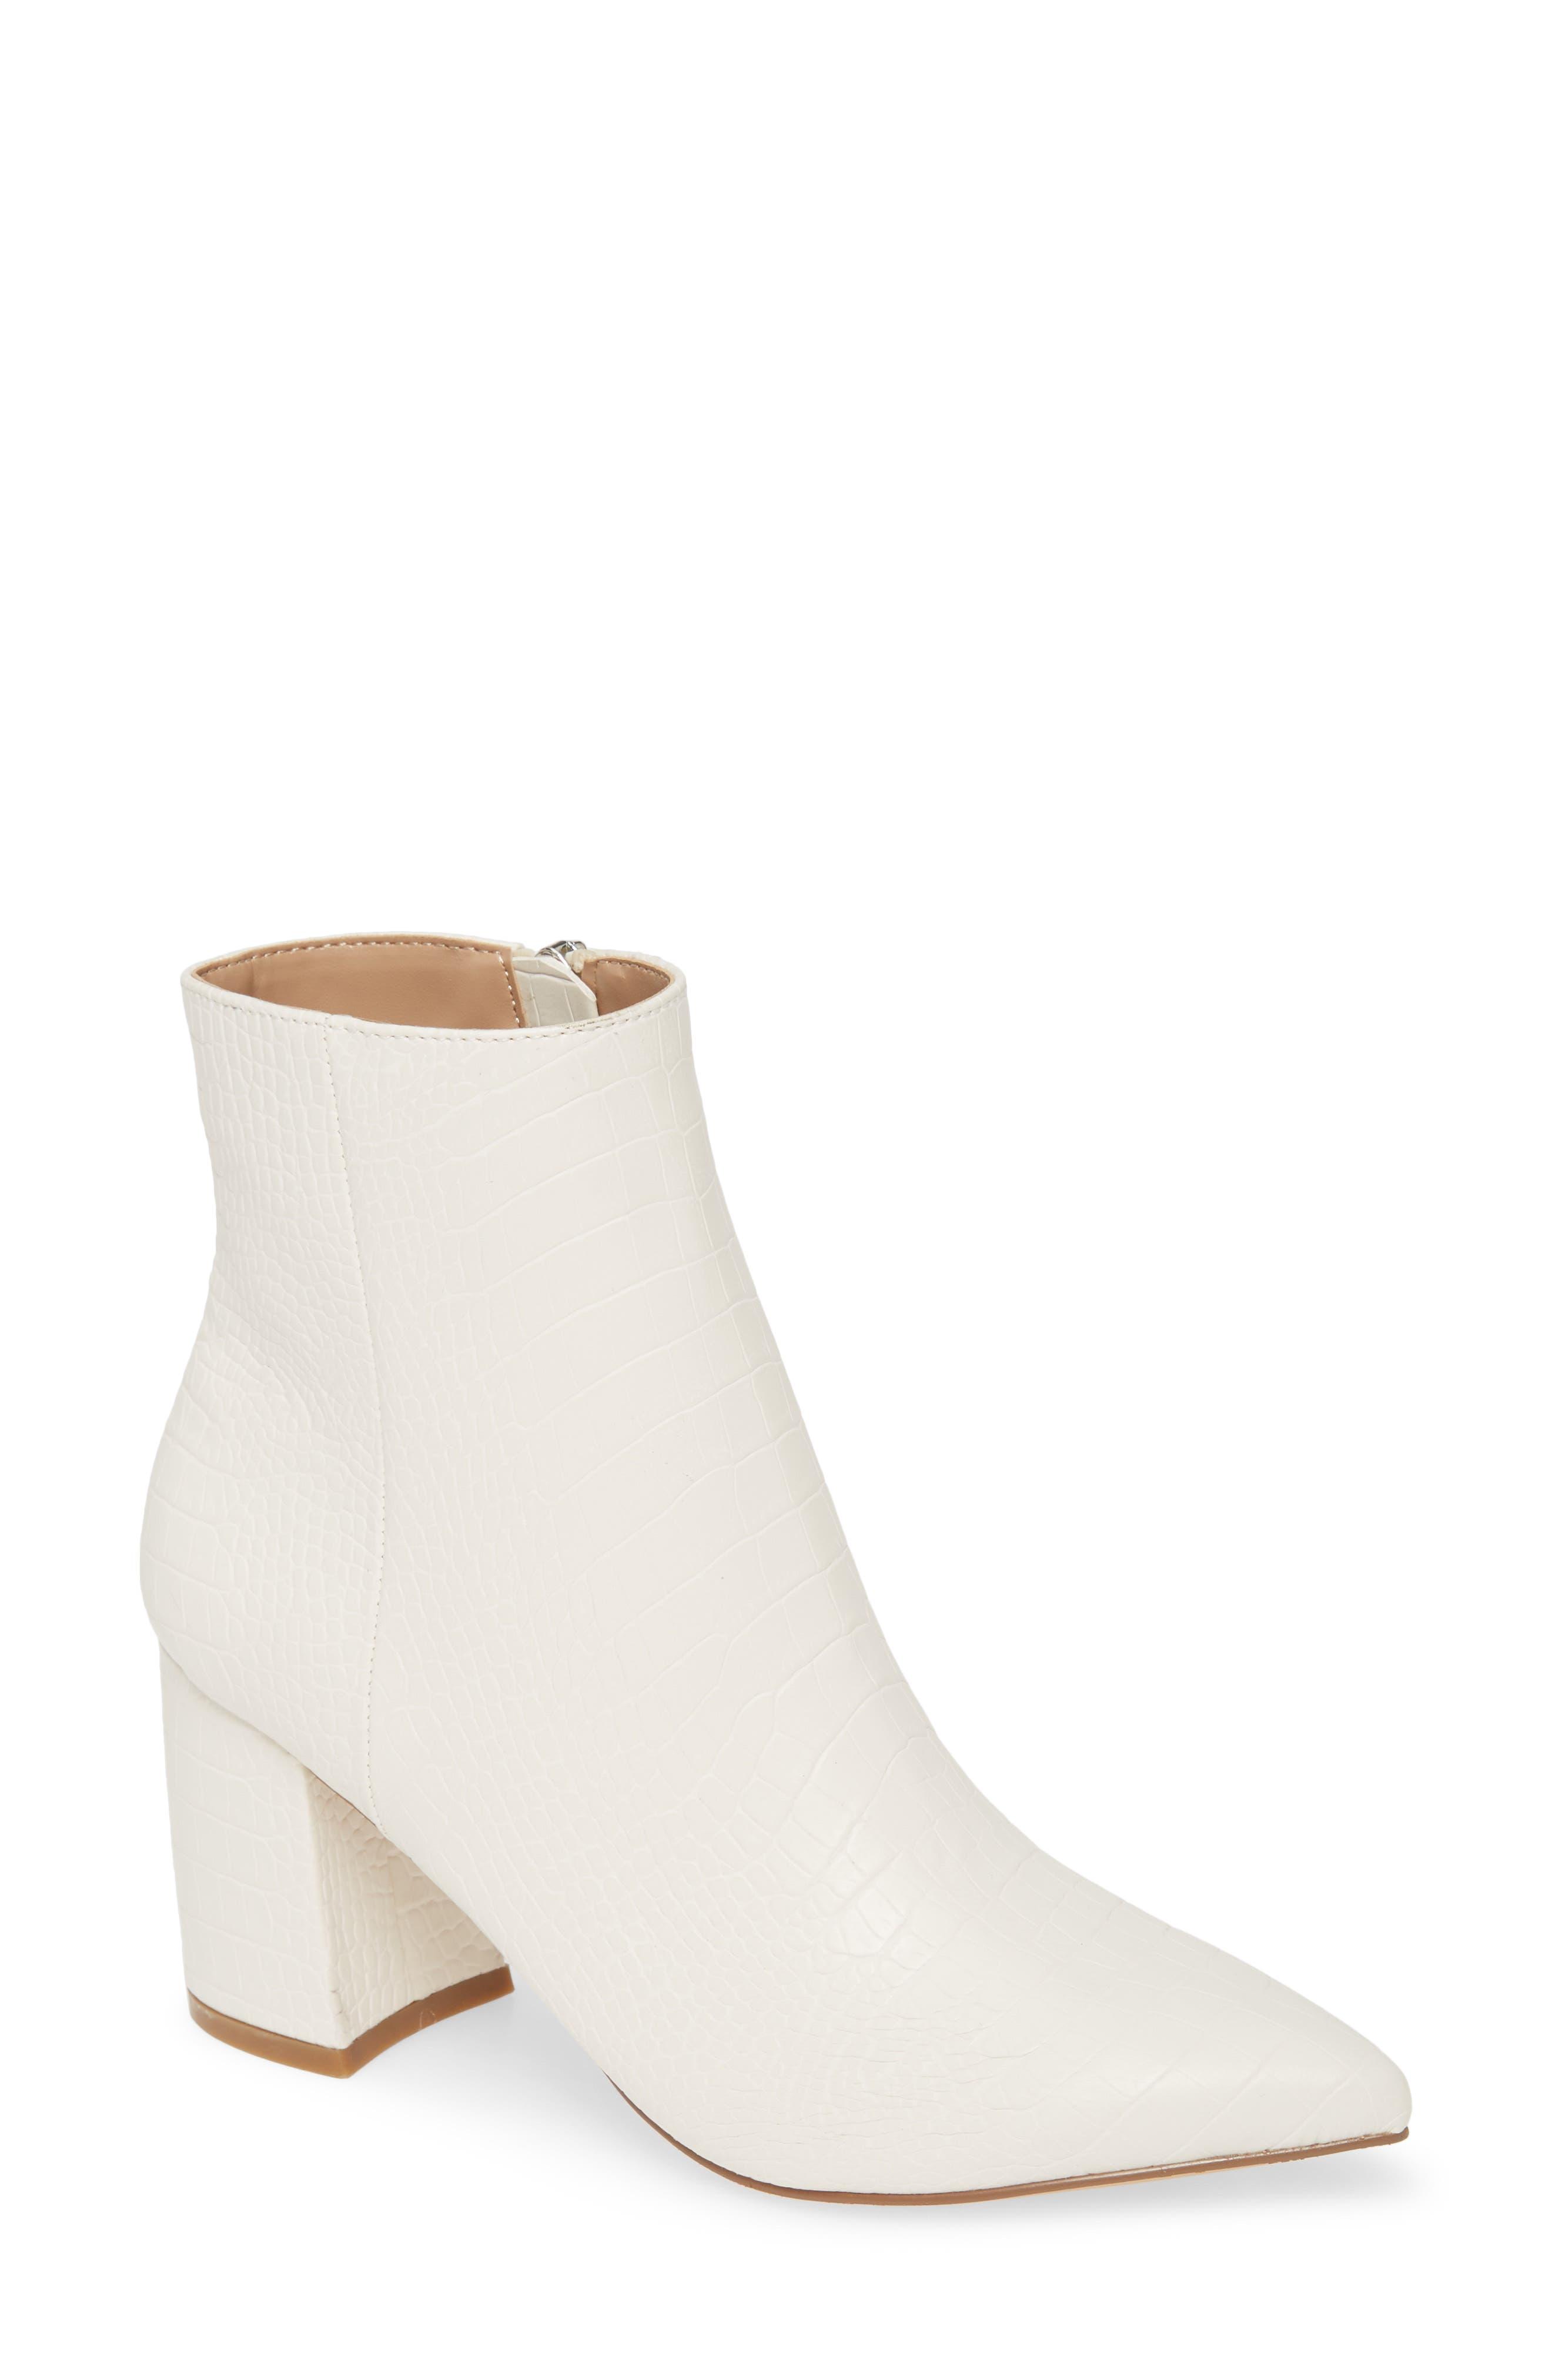 Women's Boots Work \u0026 Office Shoes